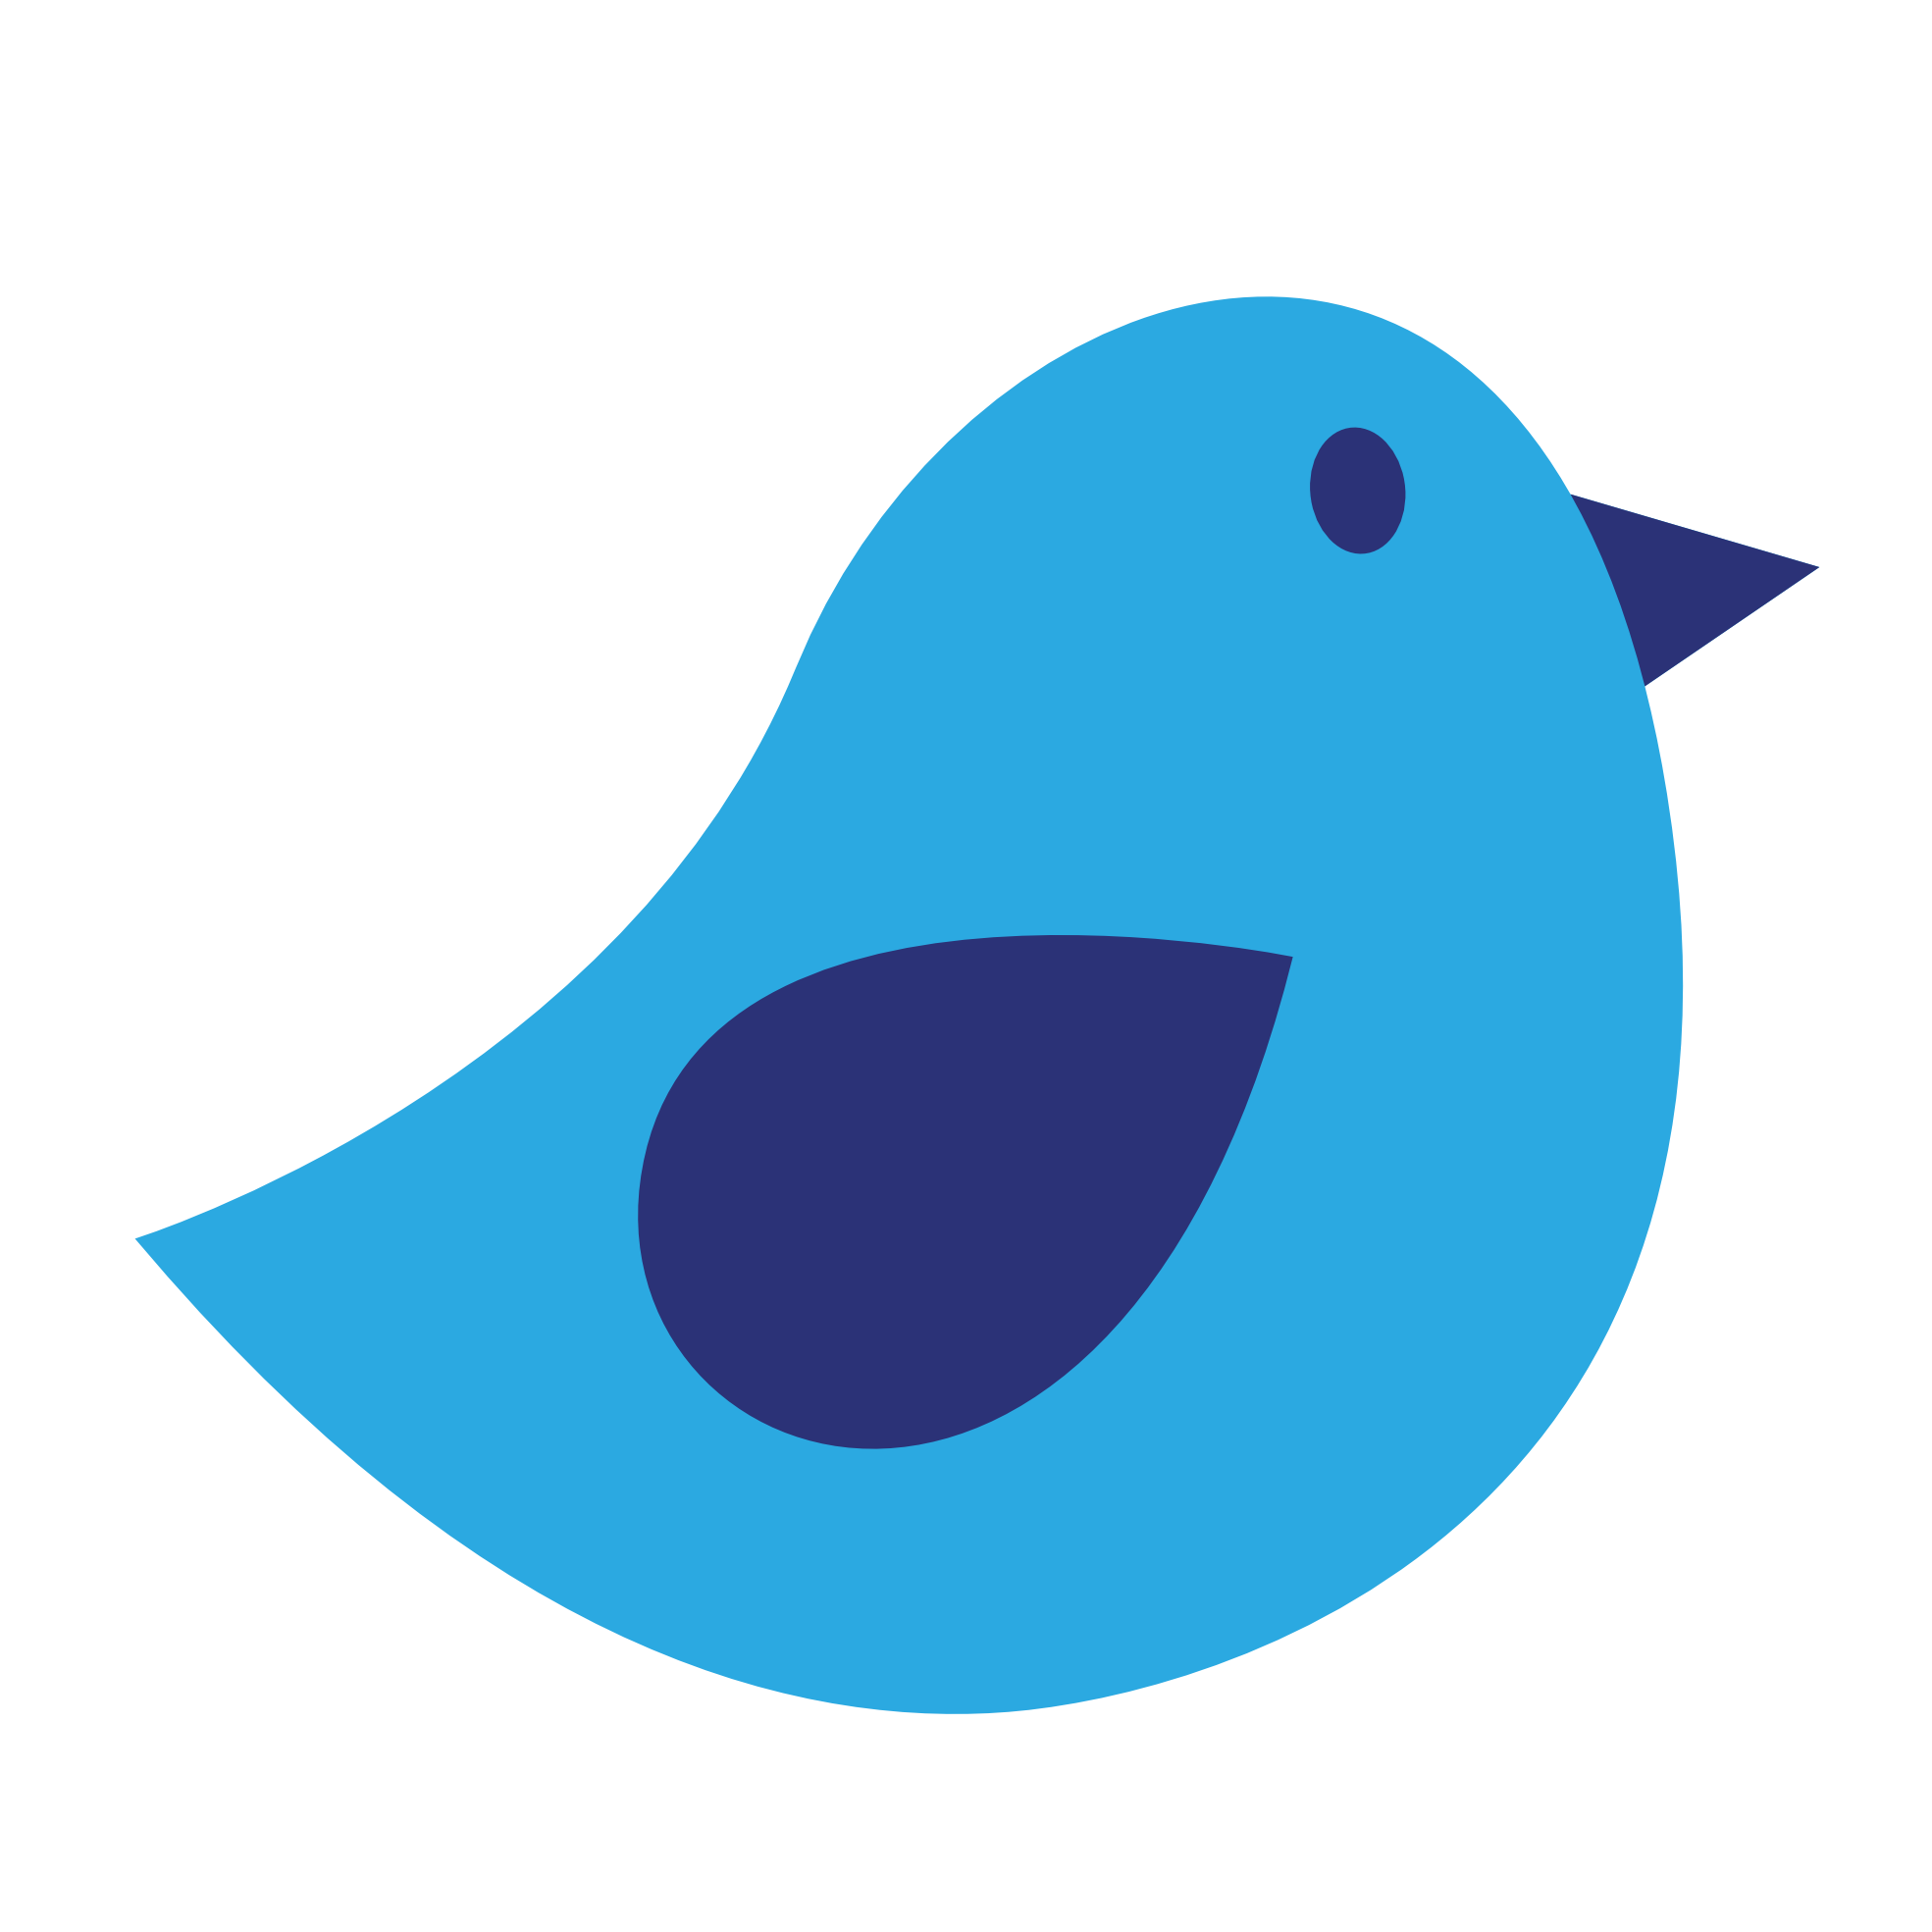 . Bird clipart simple